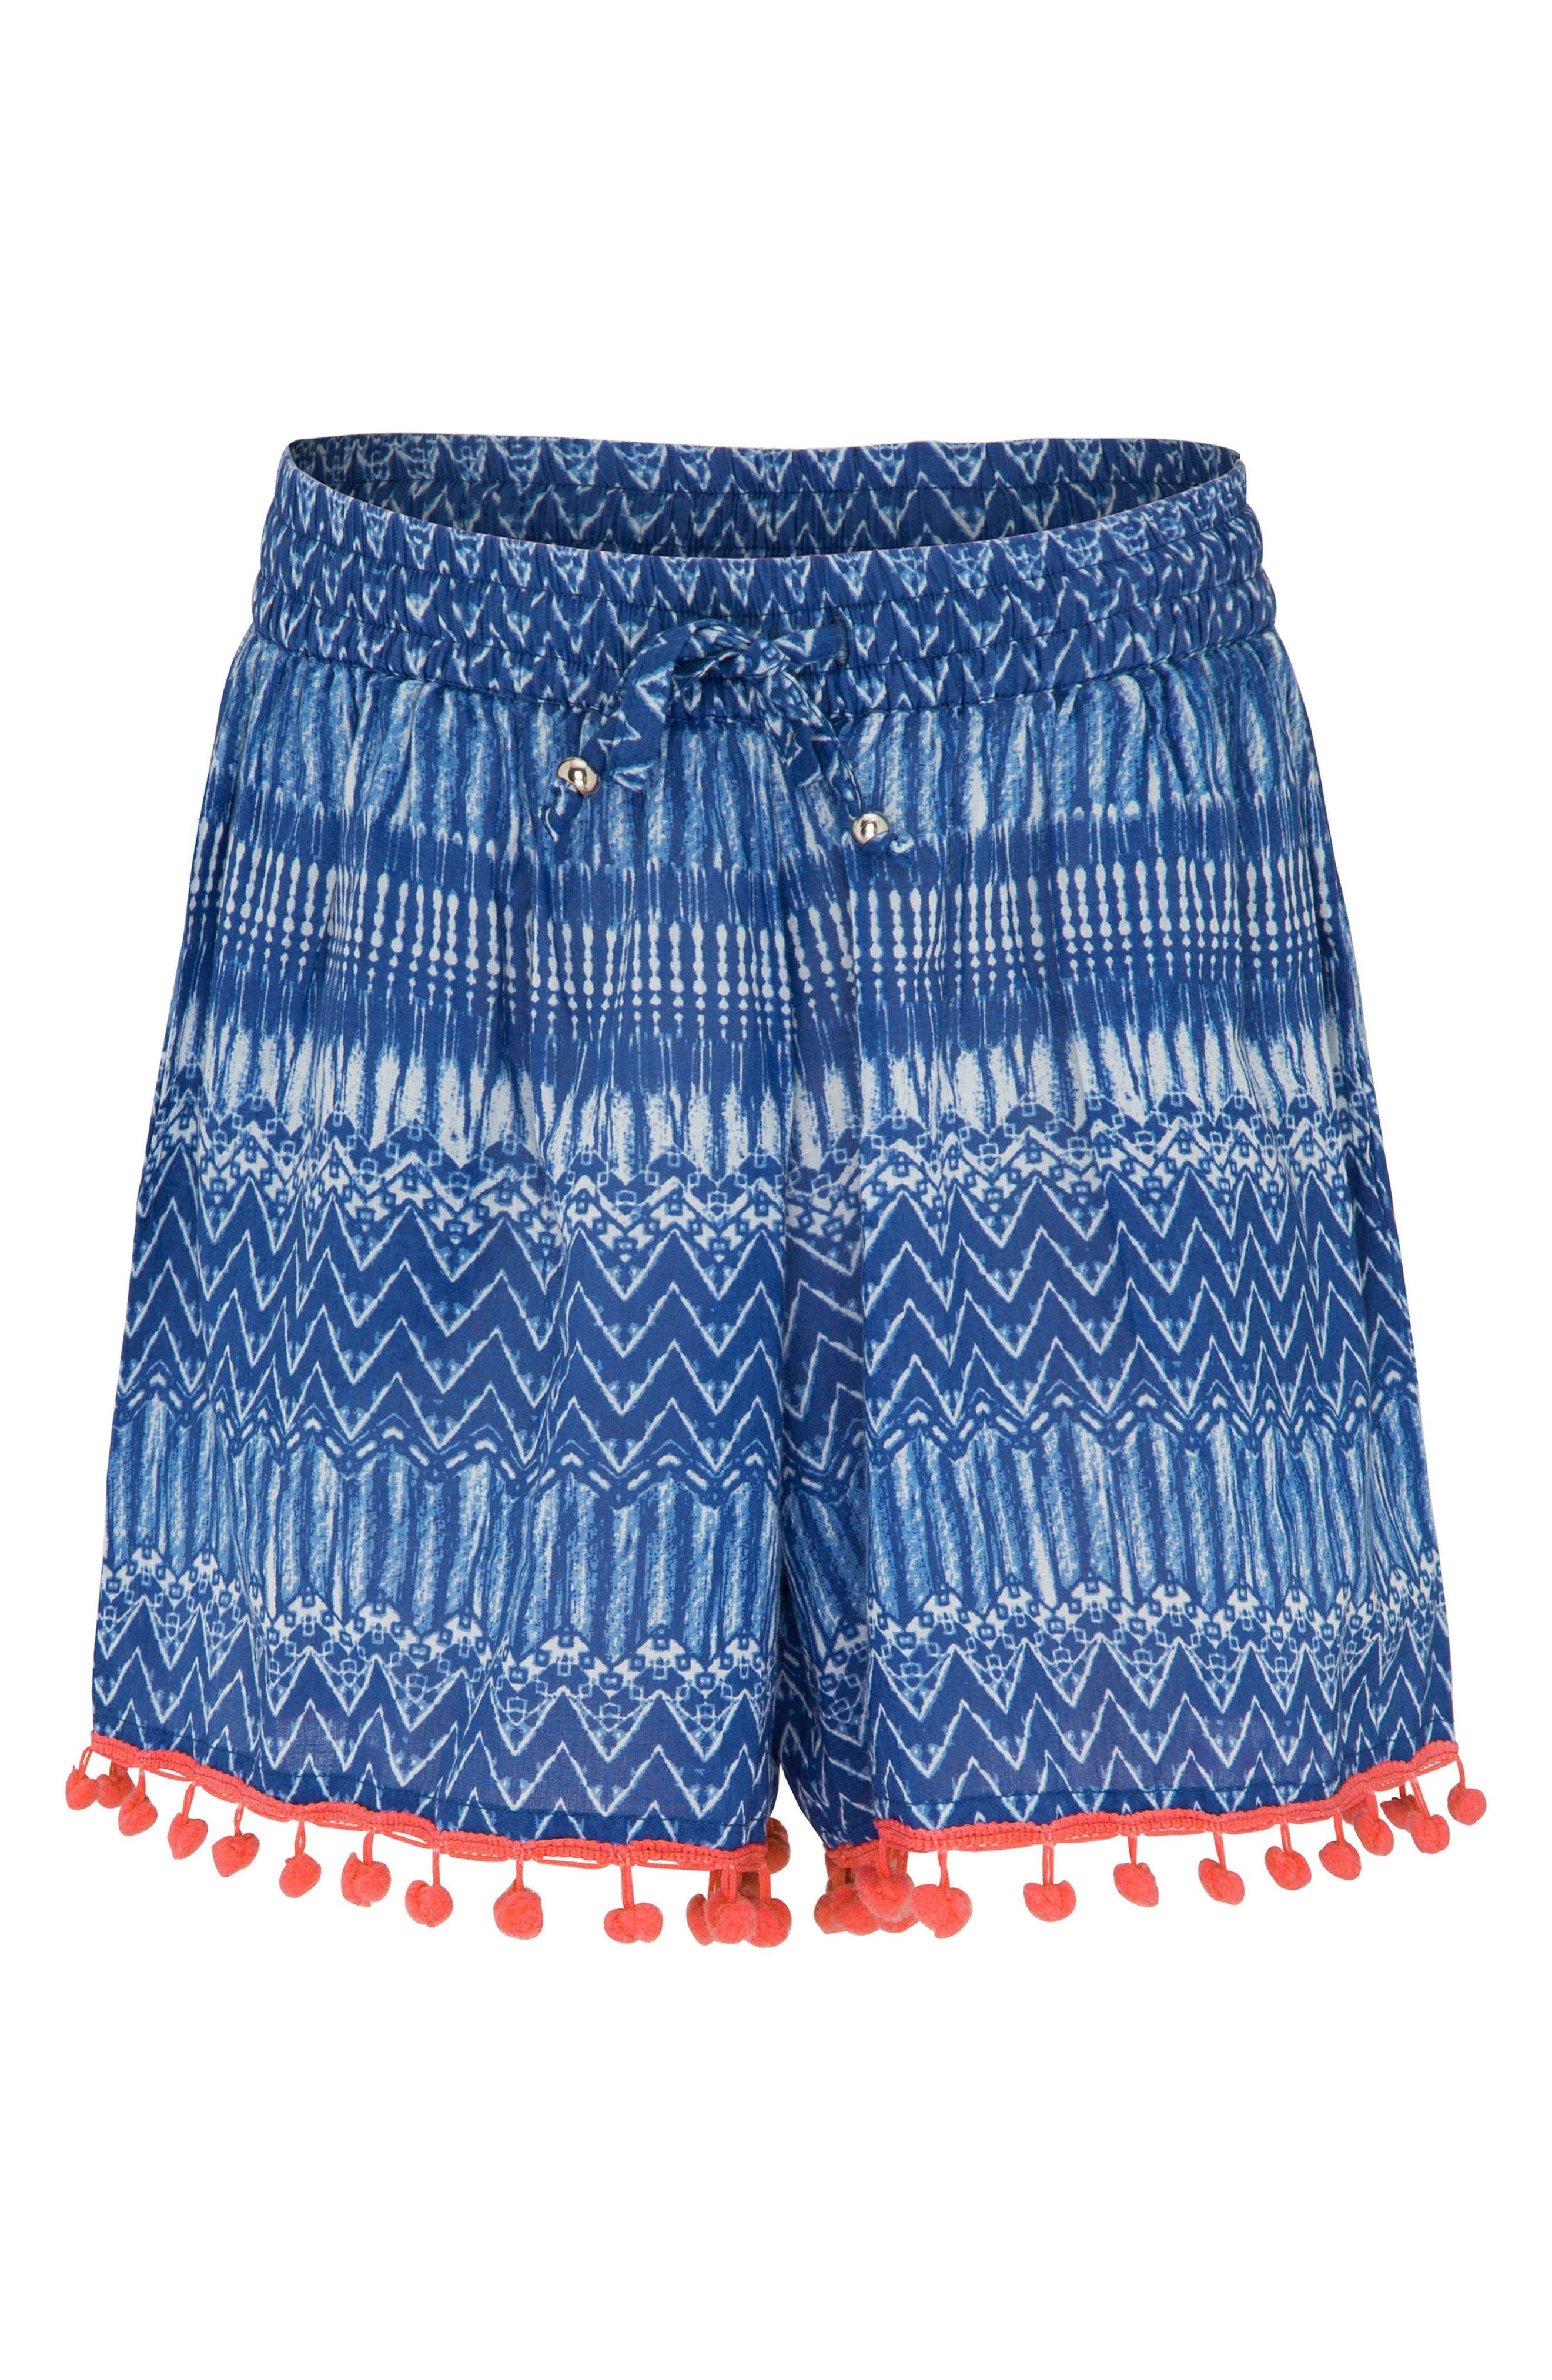 Main Image - Platypus Australia Print Cover-Up Shorts (Big Girls)